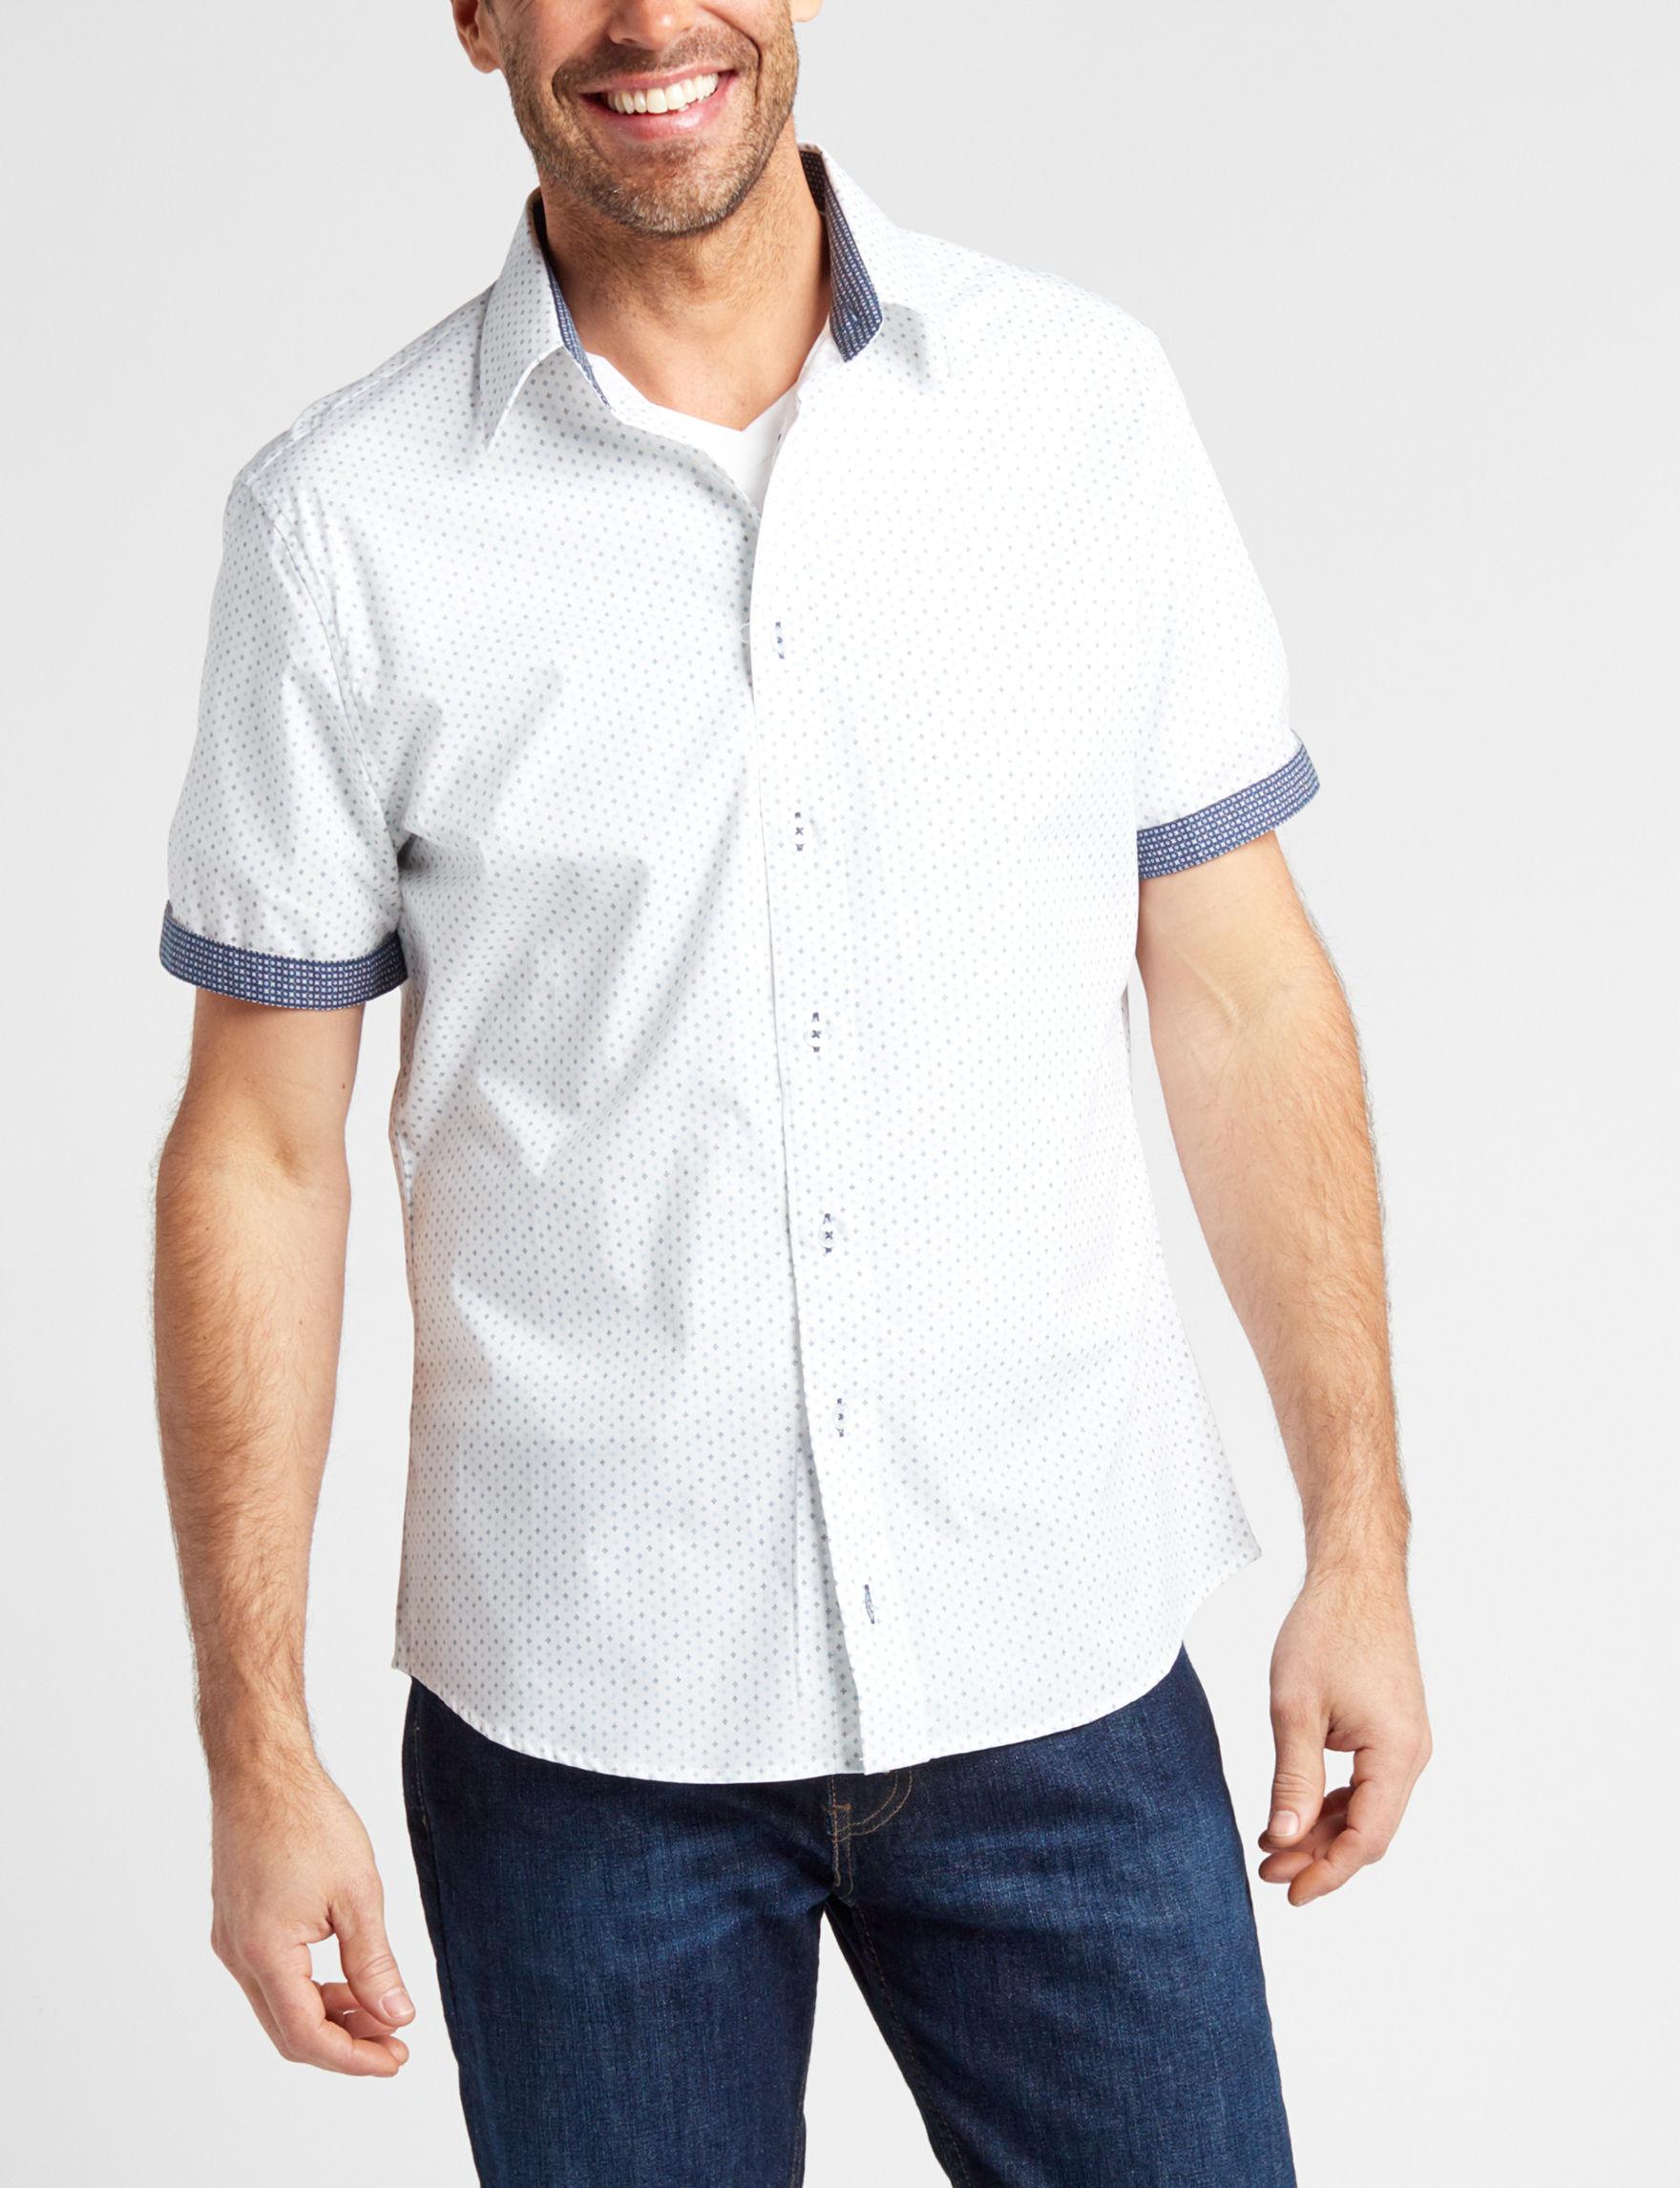 Signature Studio White / Blue Casual Button Down Shirts